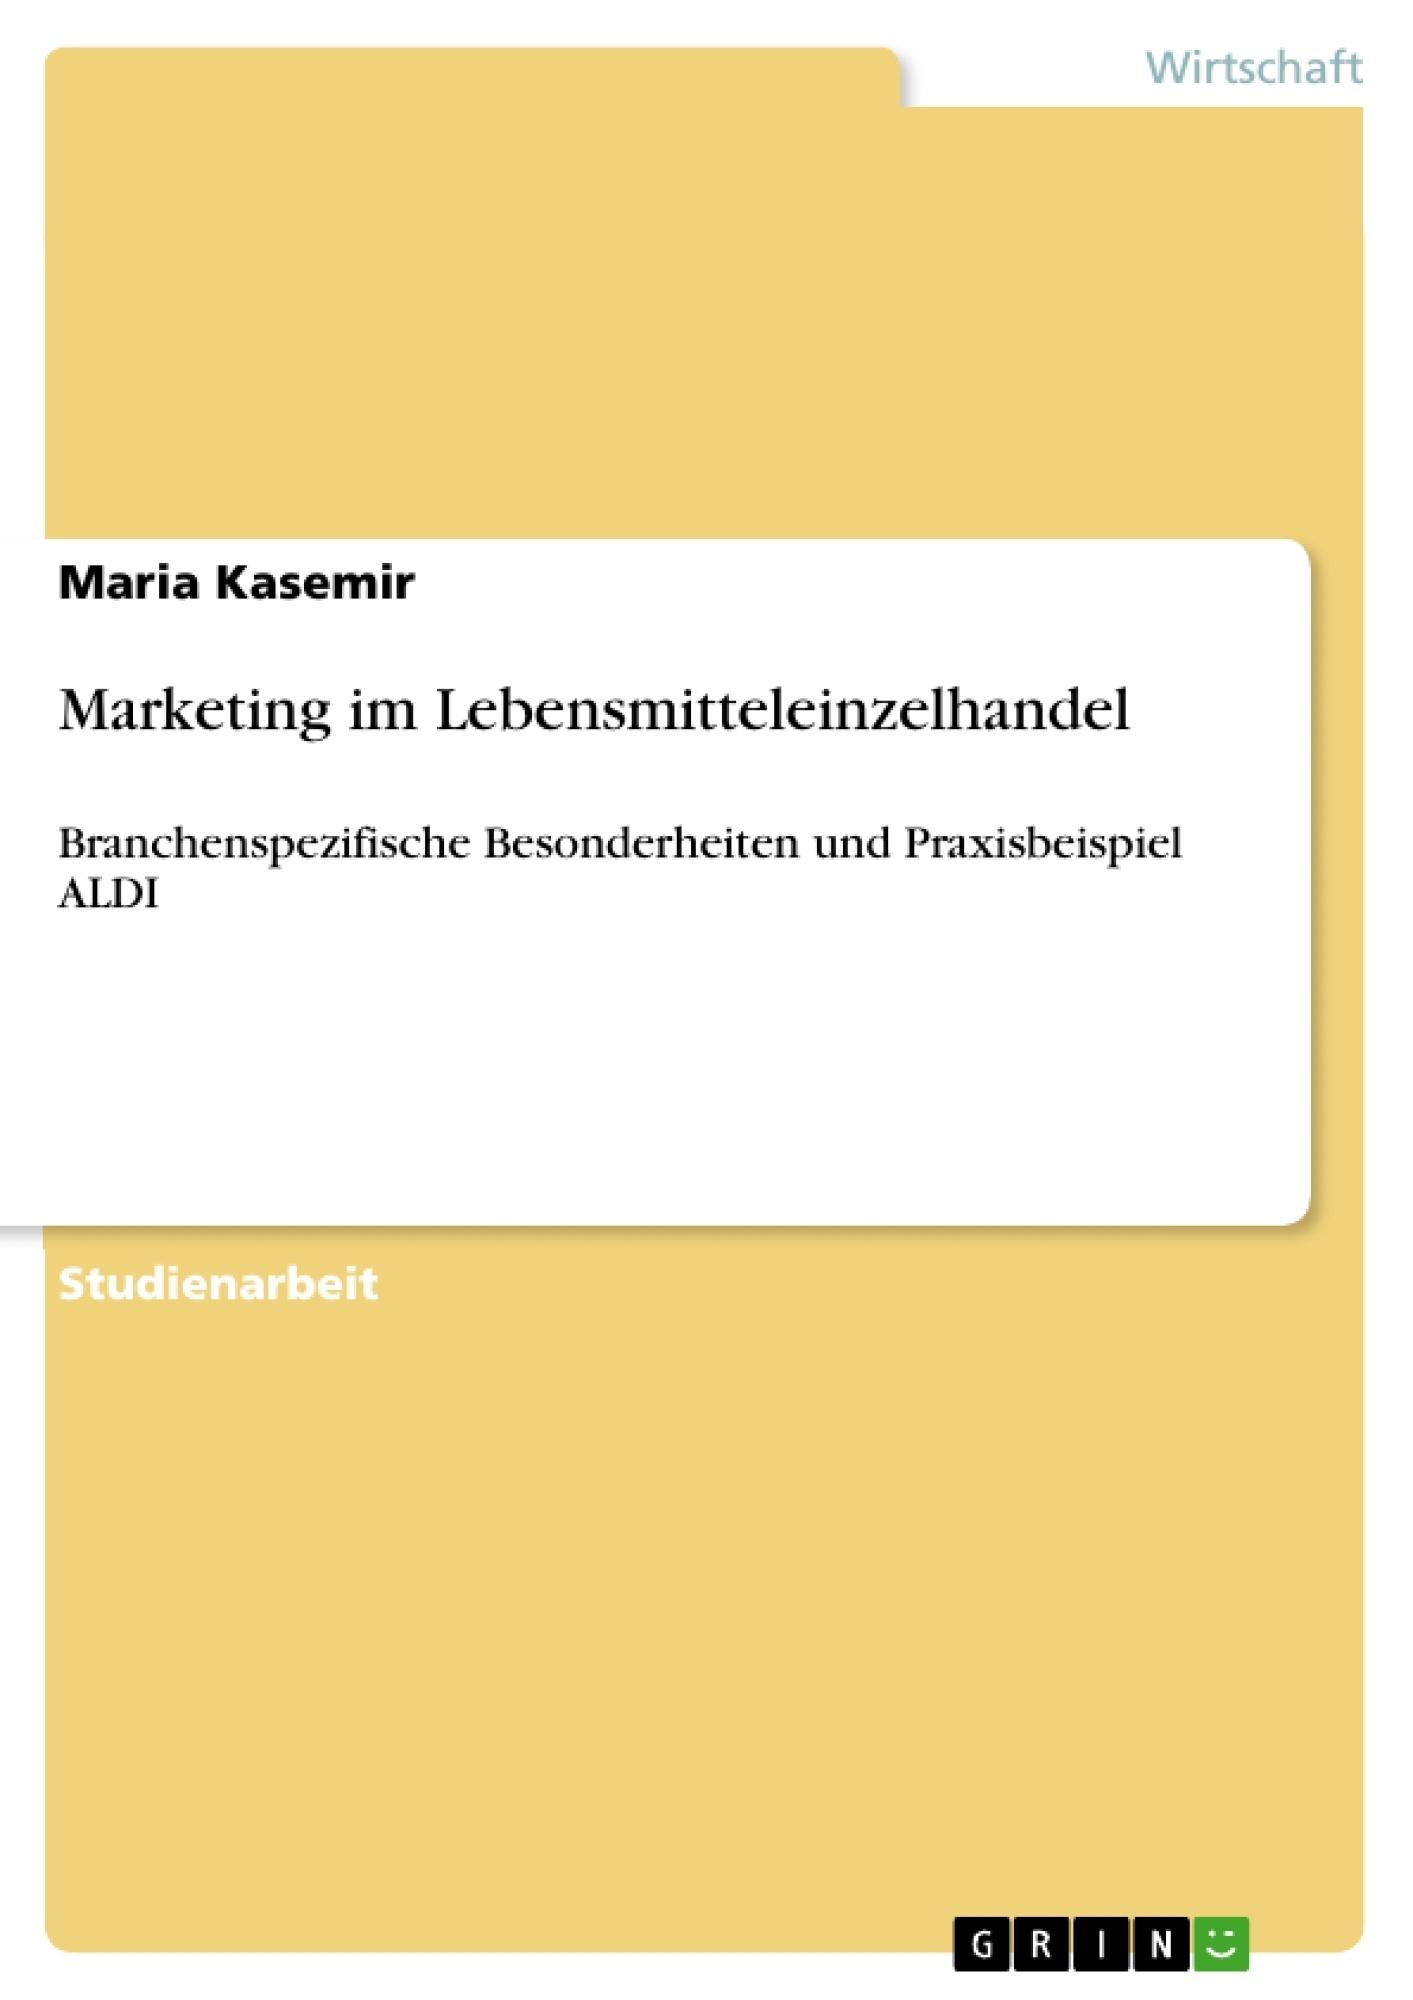 Titel: Marketing im Lebensmitteleinzelhandel